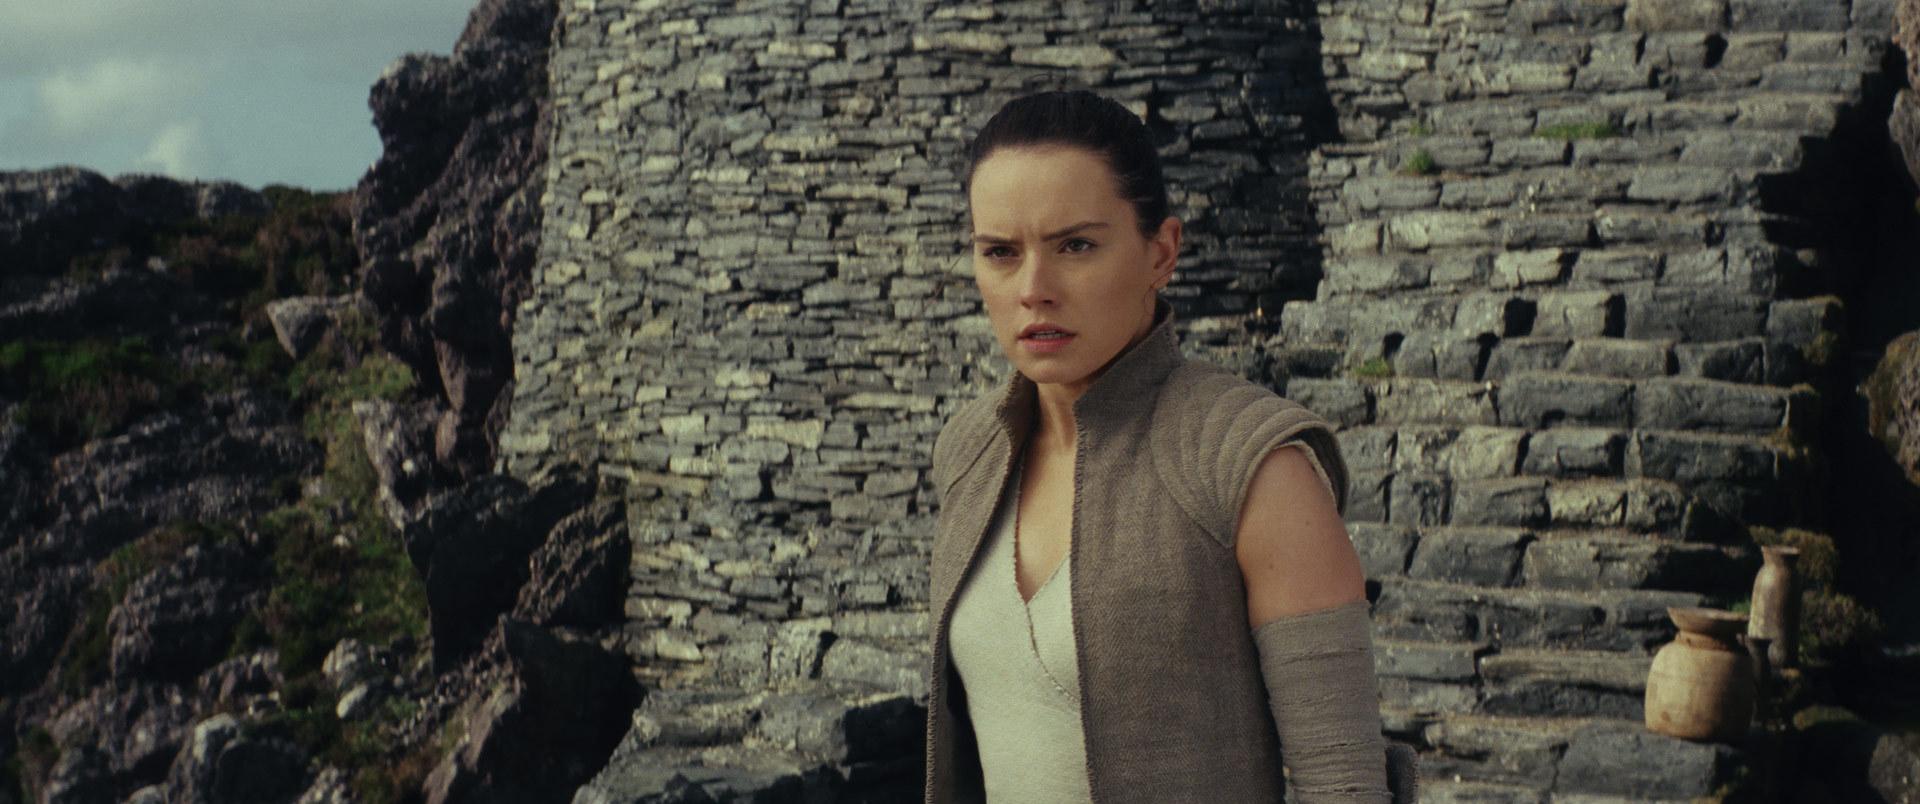 Daisy Ridley sebagai Rey dalam 'Star Wars: The Last Jedi'. Foto dari starwars.com